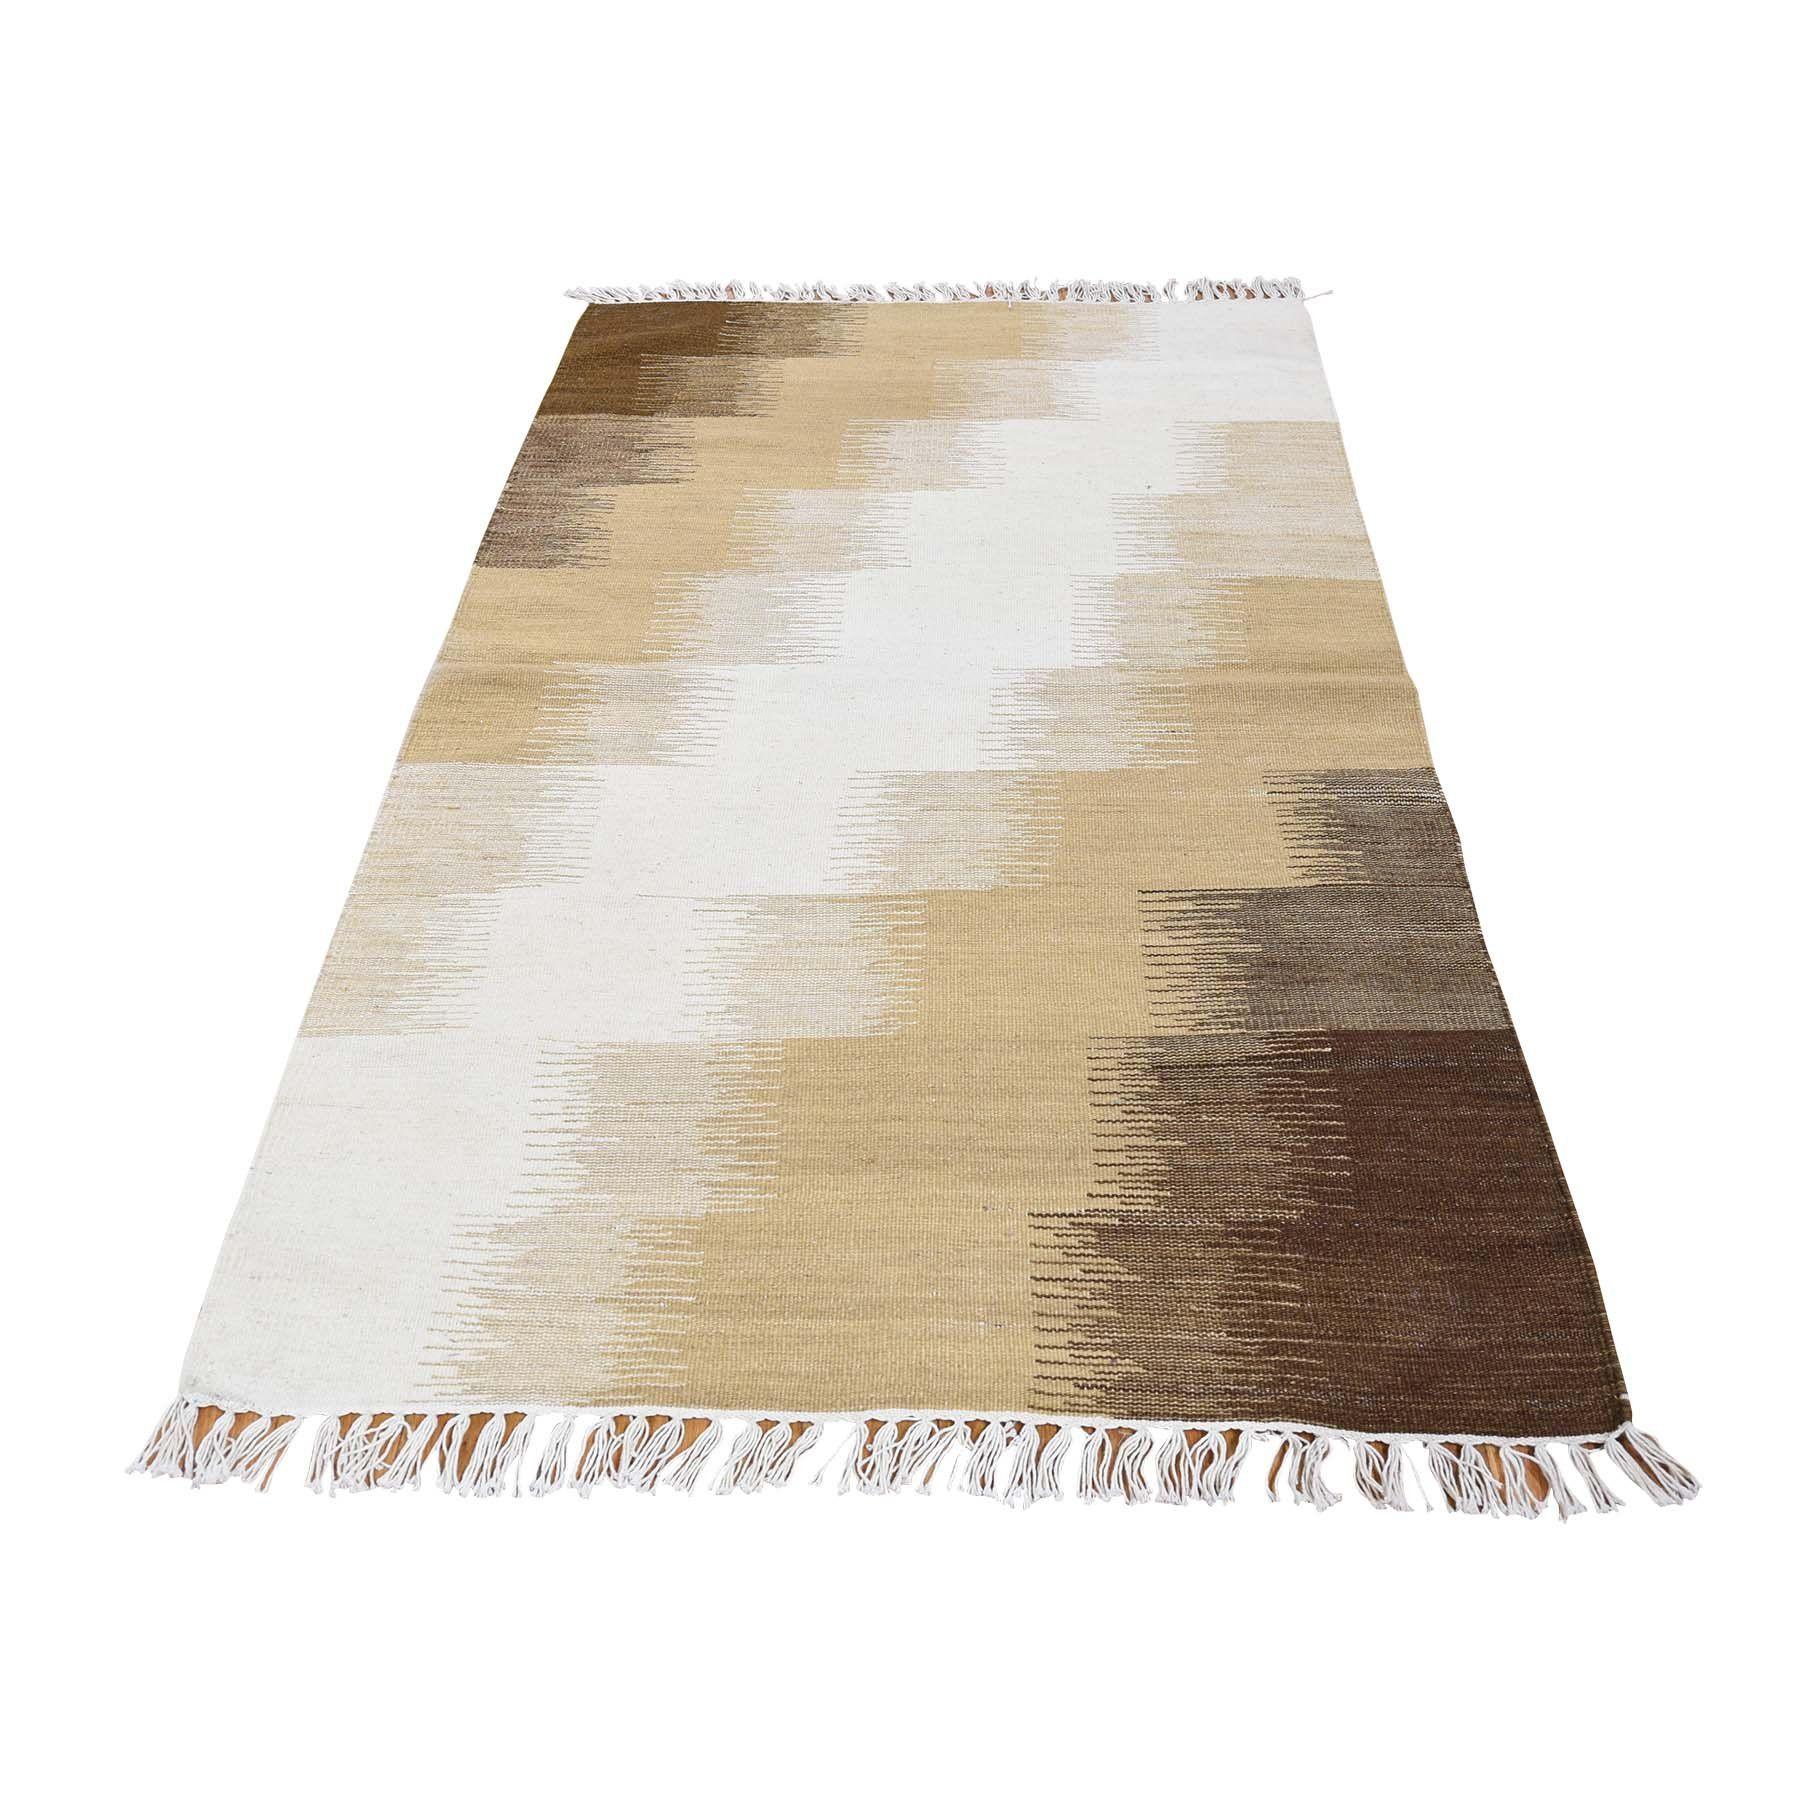 Handmade Flat Weave Rectangle Rug Design Ccsr40099 Size 3 0 Area Rugs Wool Area Rugs Flat Weave